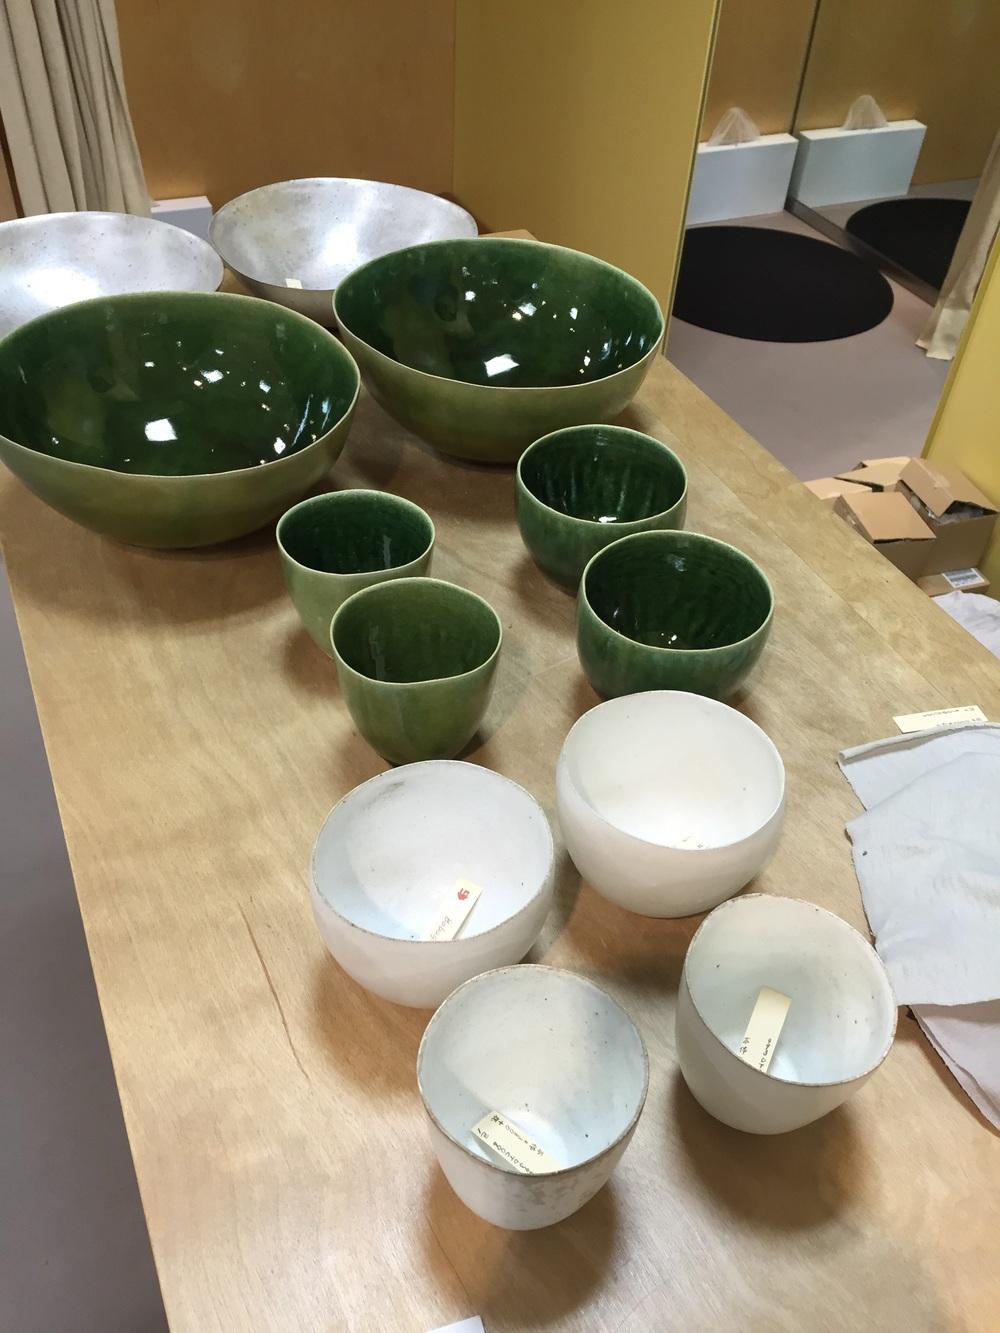 Jurgen Lehl's ceramics are on their way to Asiatica.